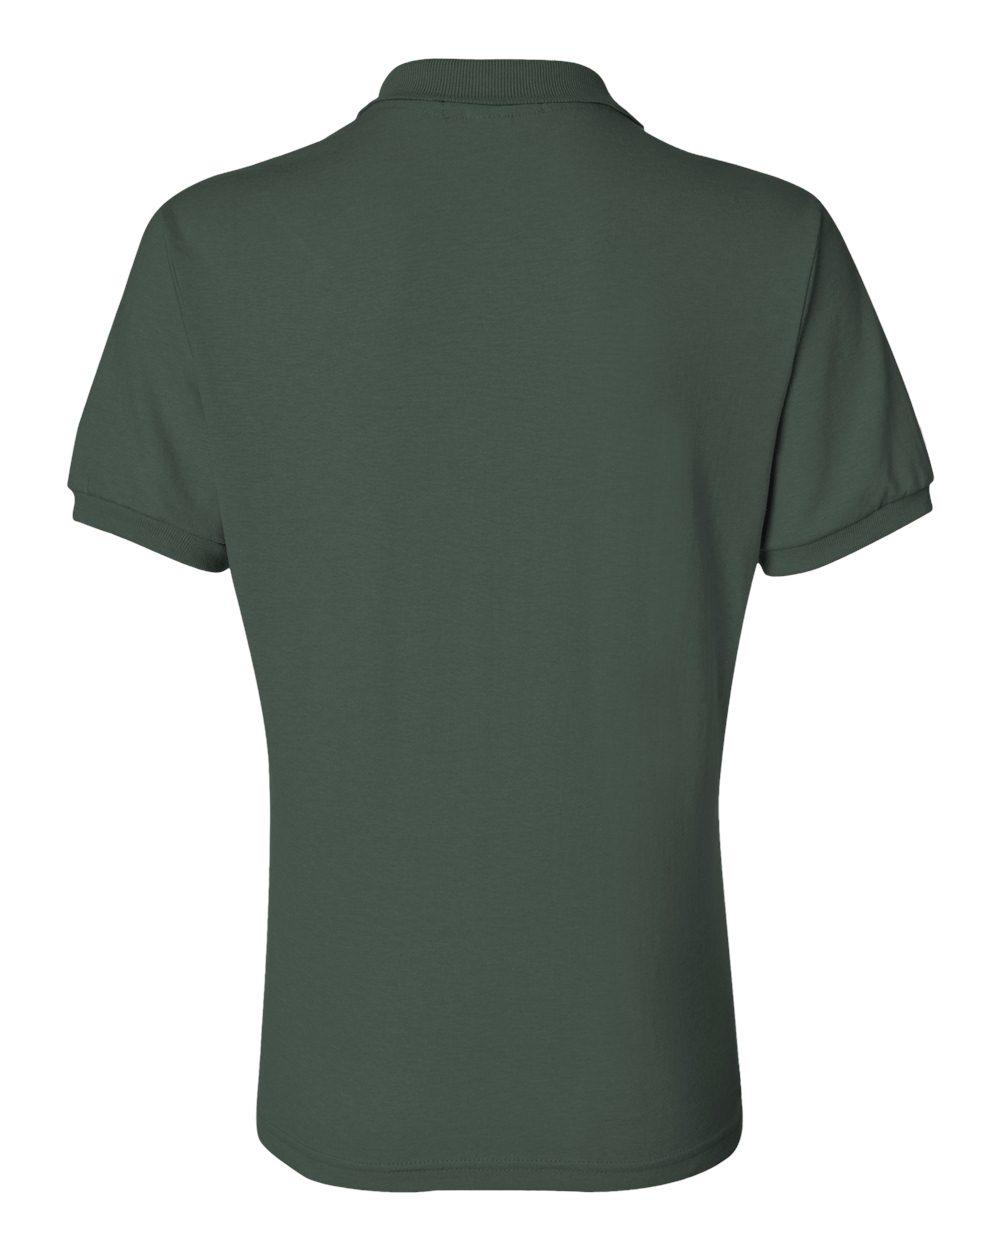 Jerzees-Womens-5-6-oz-50-50-Jersey-Polo-with-Spot-Shield-437W-Size-S-2XL thumbnail 26